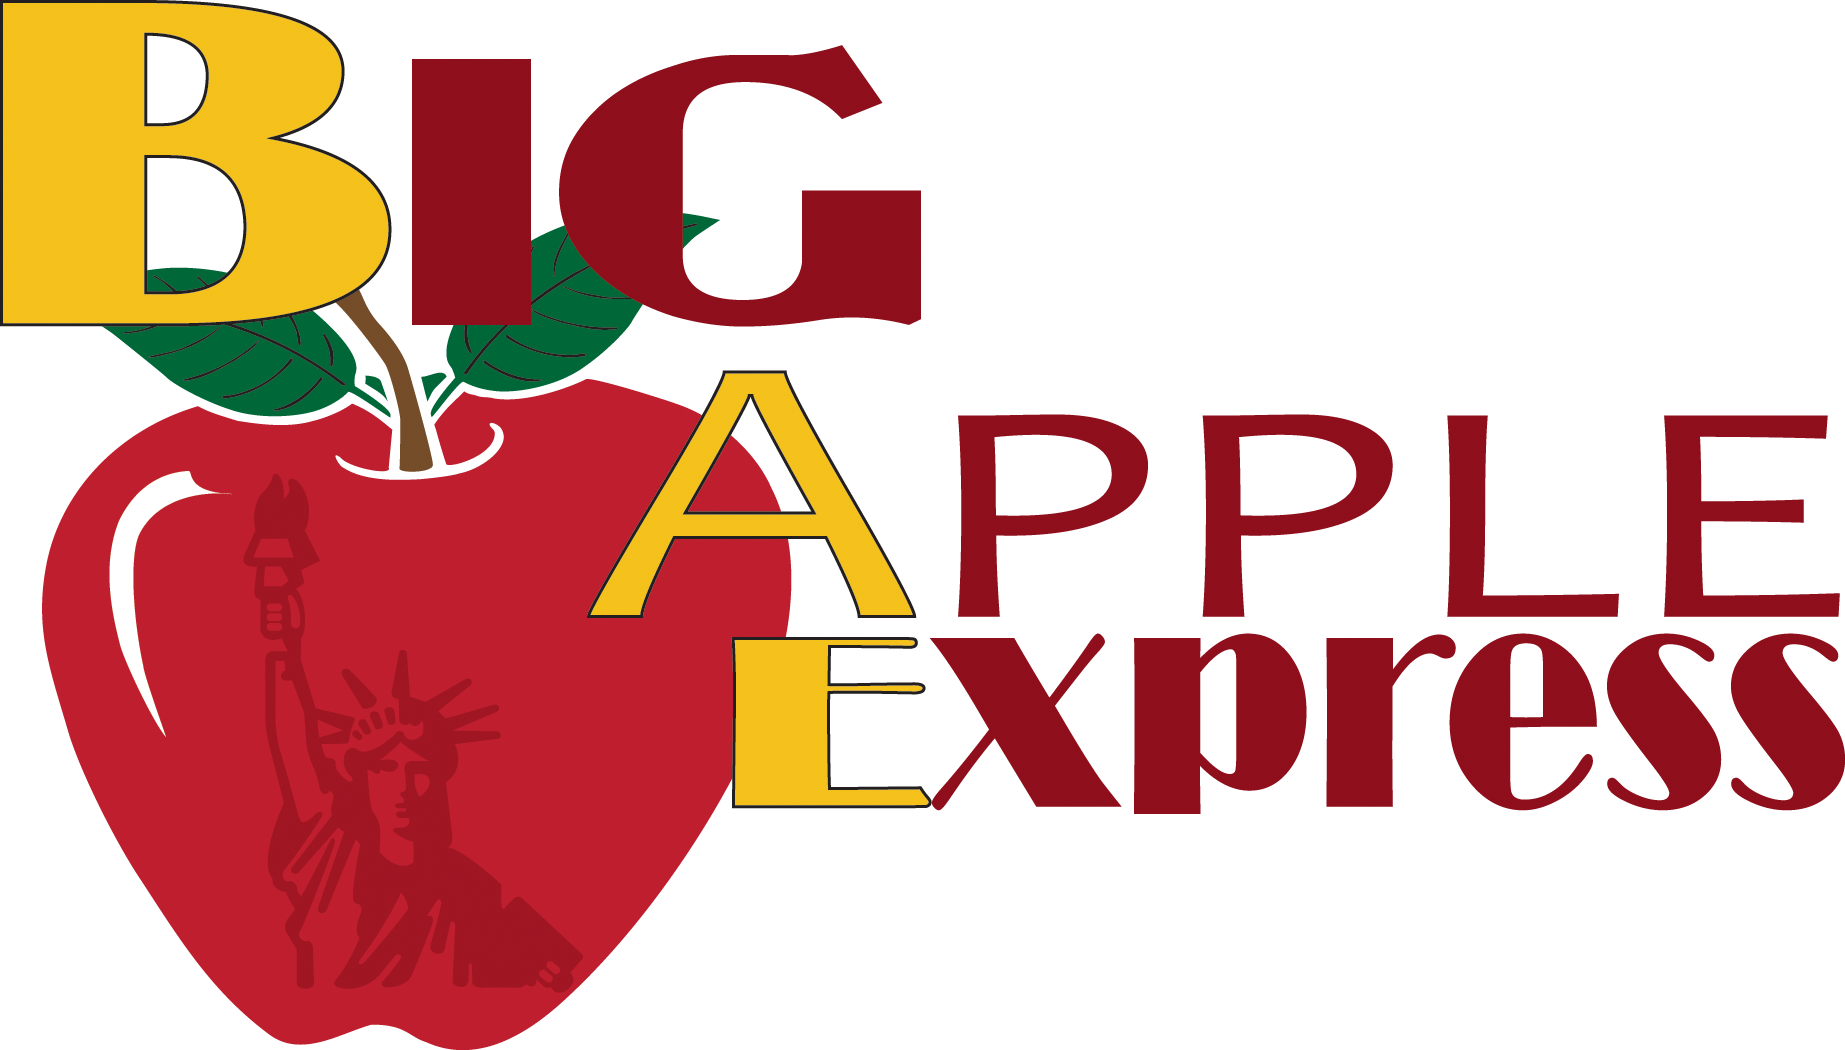 New york city clipart big apple jpg stock Big Apple Express to New York City jpg stock